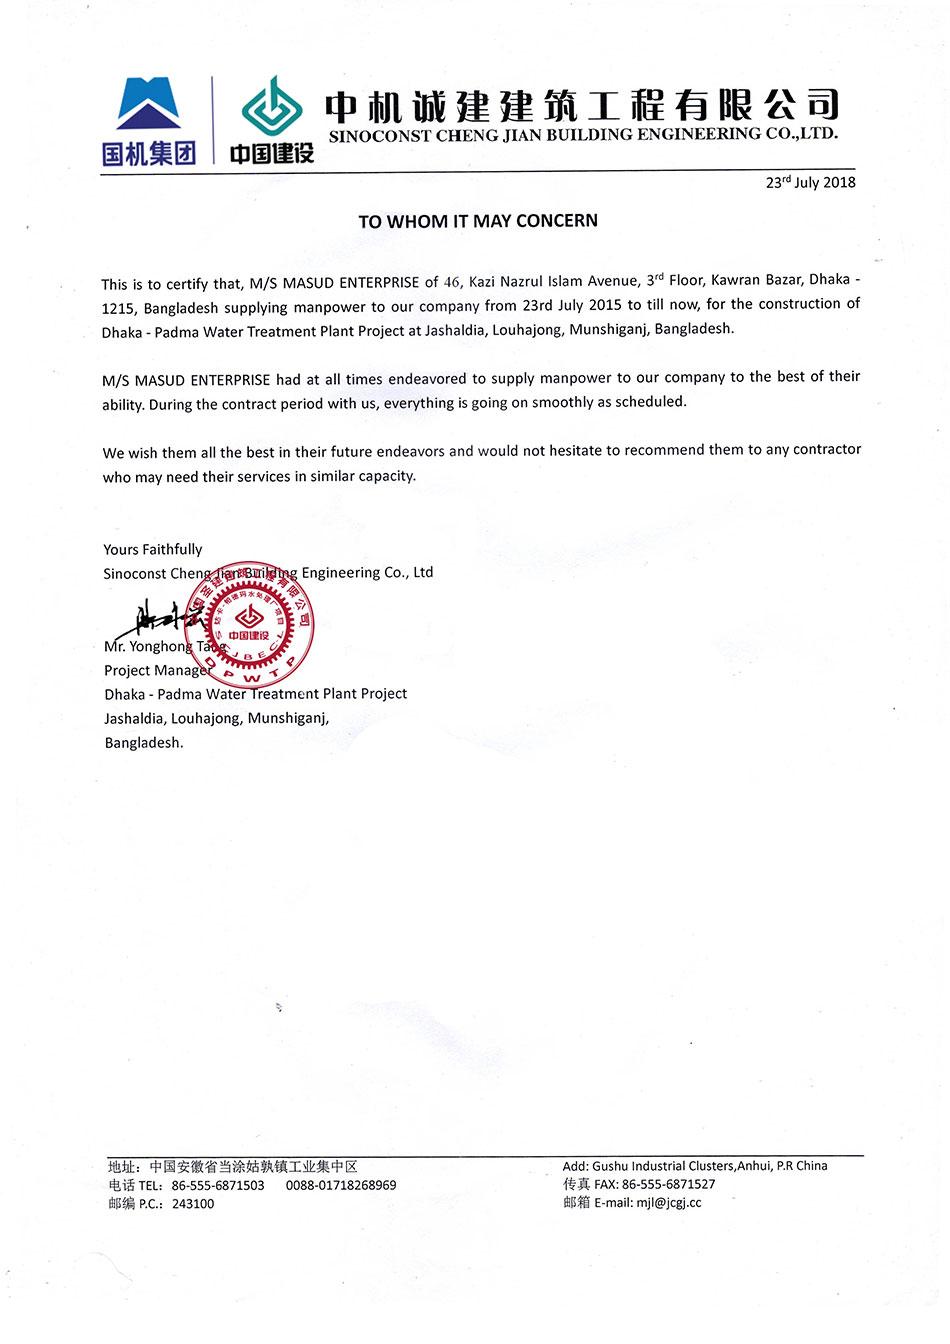 certificate_img5